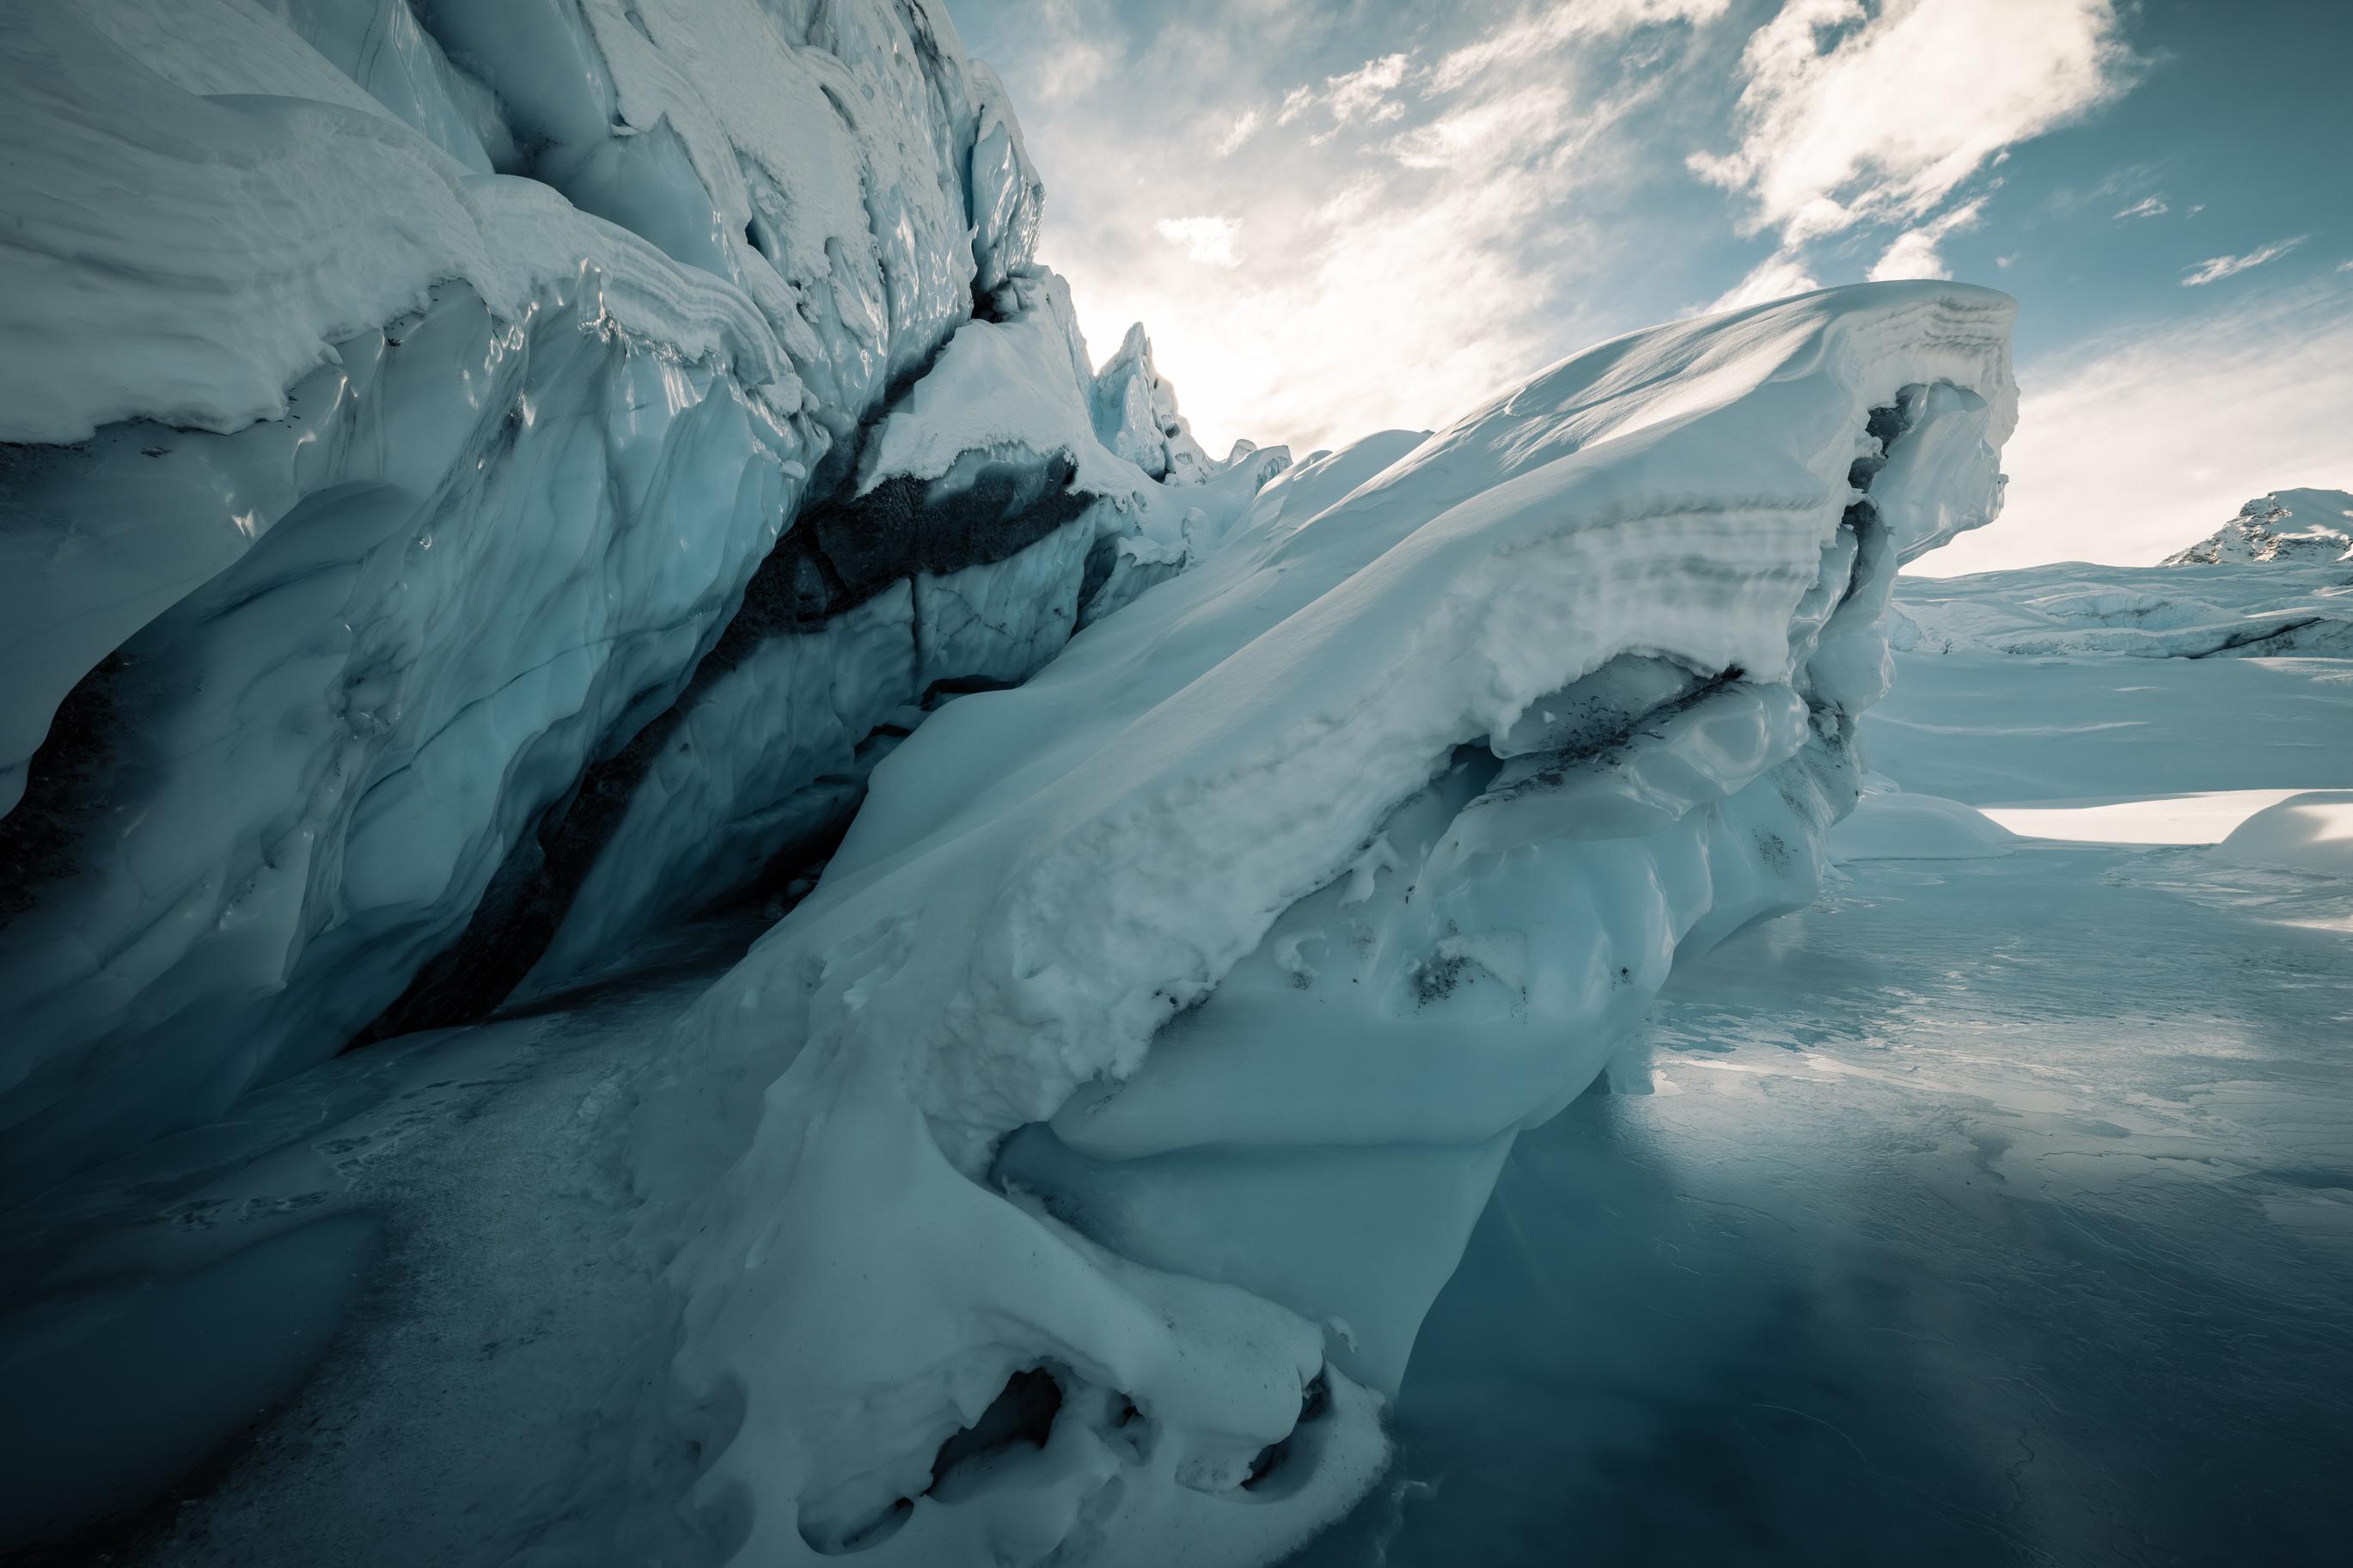 Free Images Alaska Matanuska Freezing Iceberg Arctic